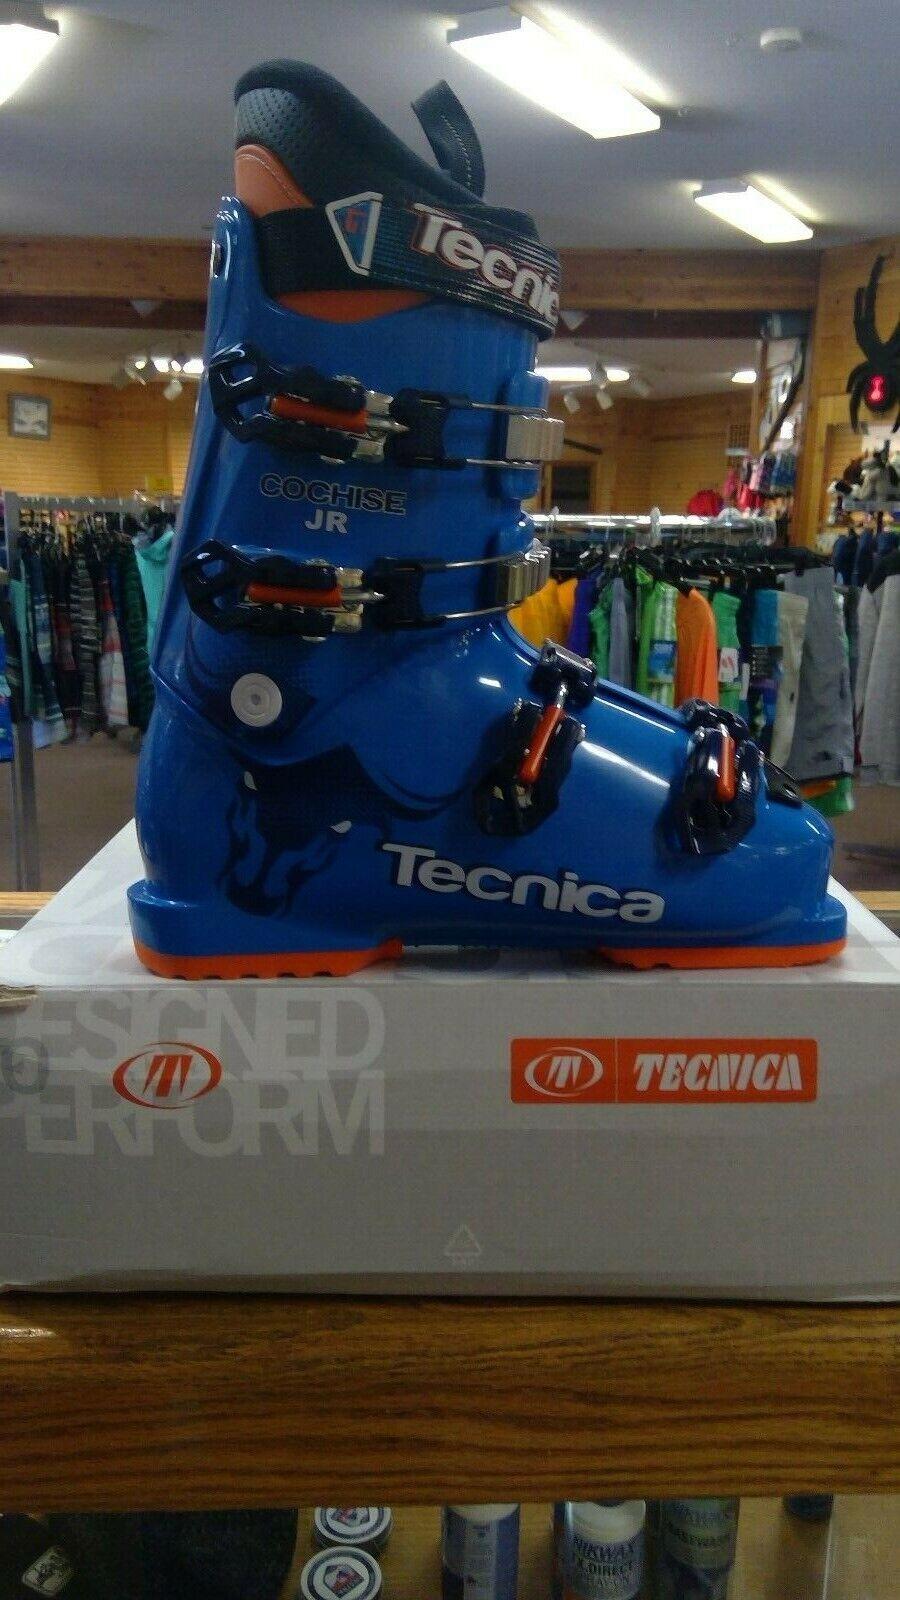 TECNICA CO SE  JR - size 27.5    115876  online cheap